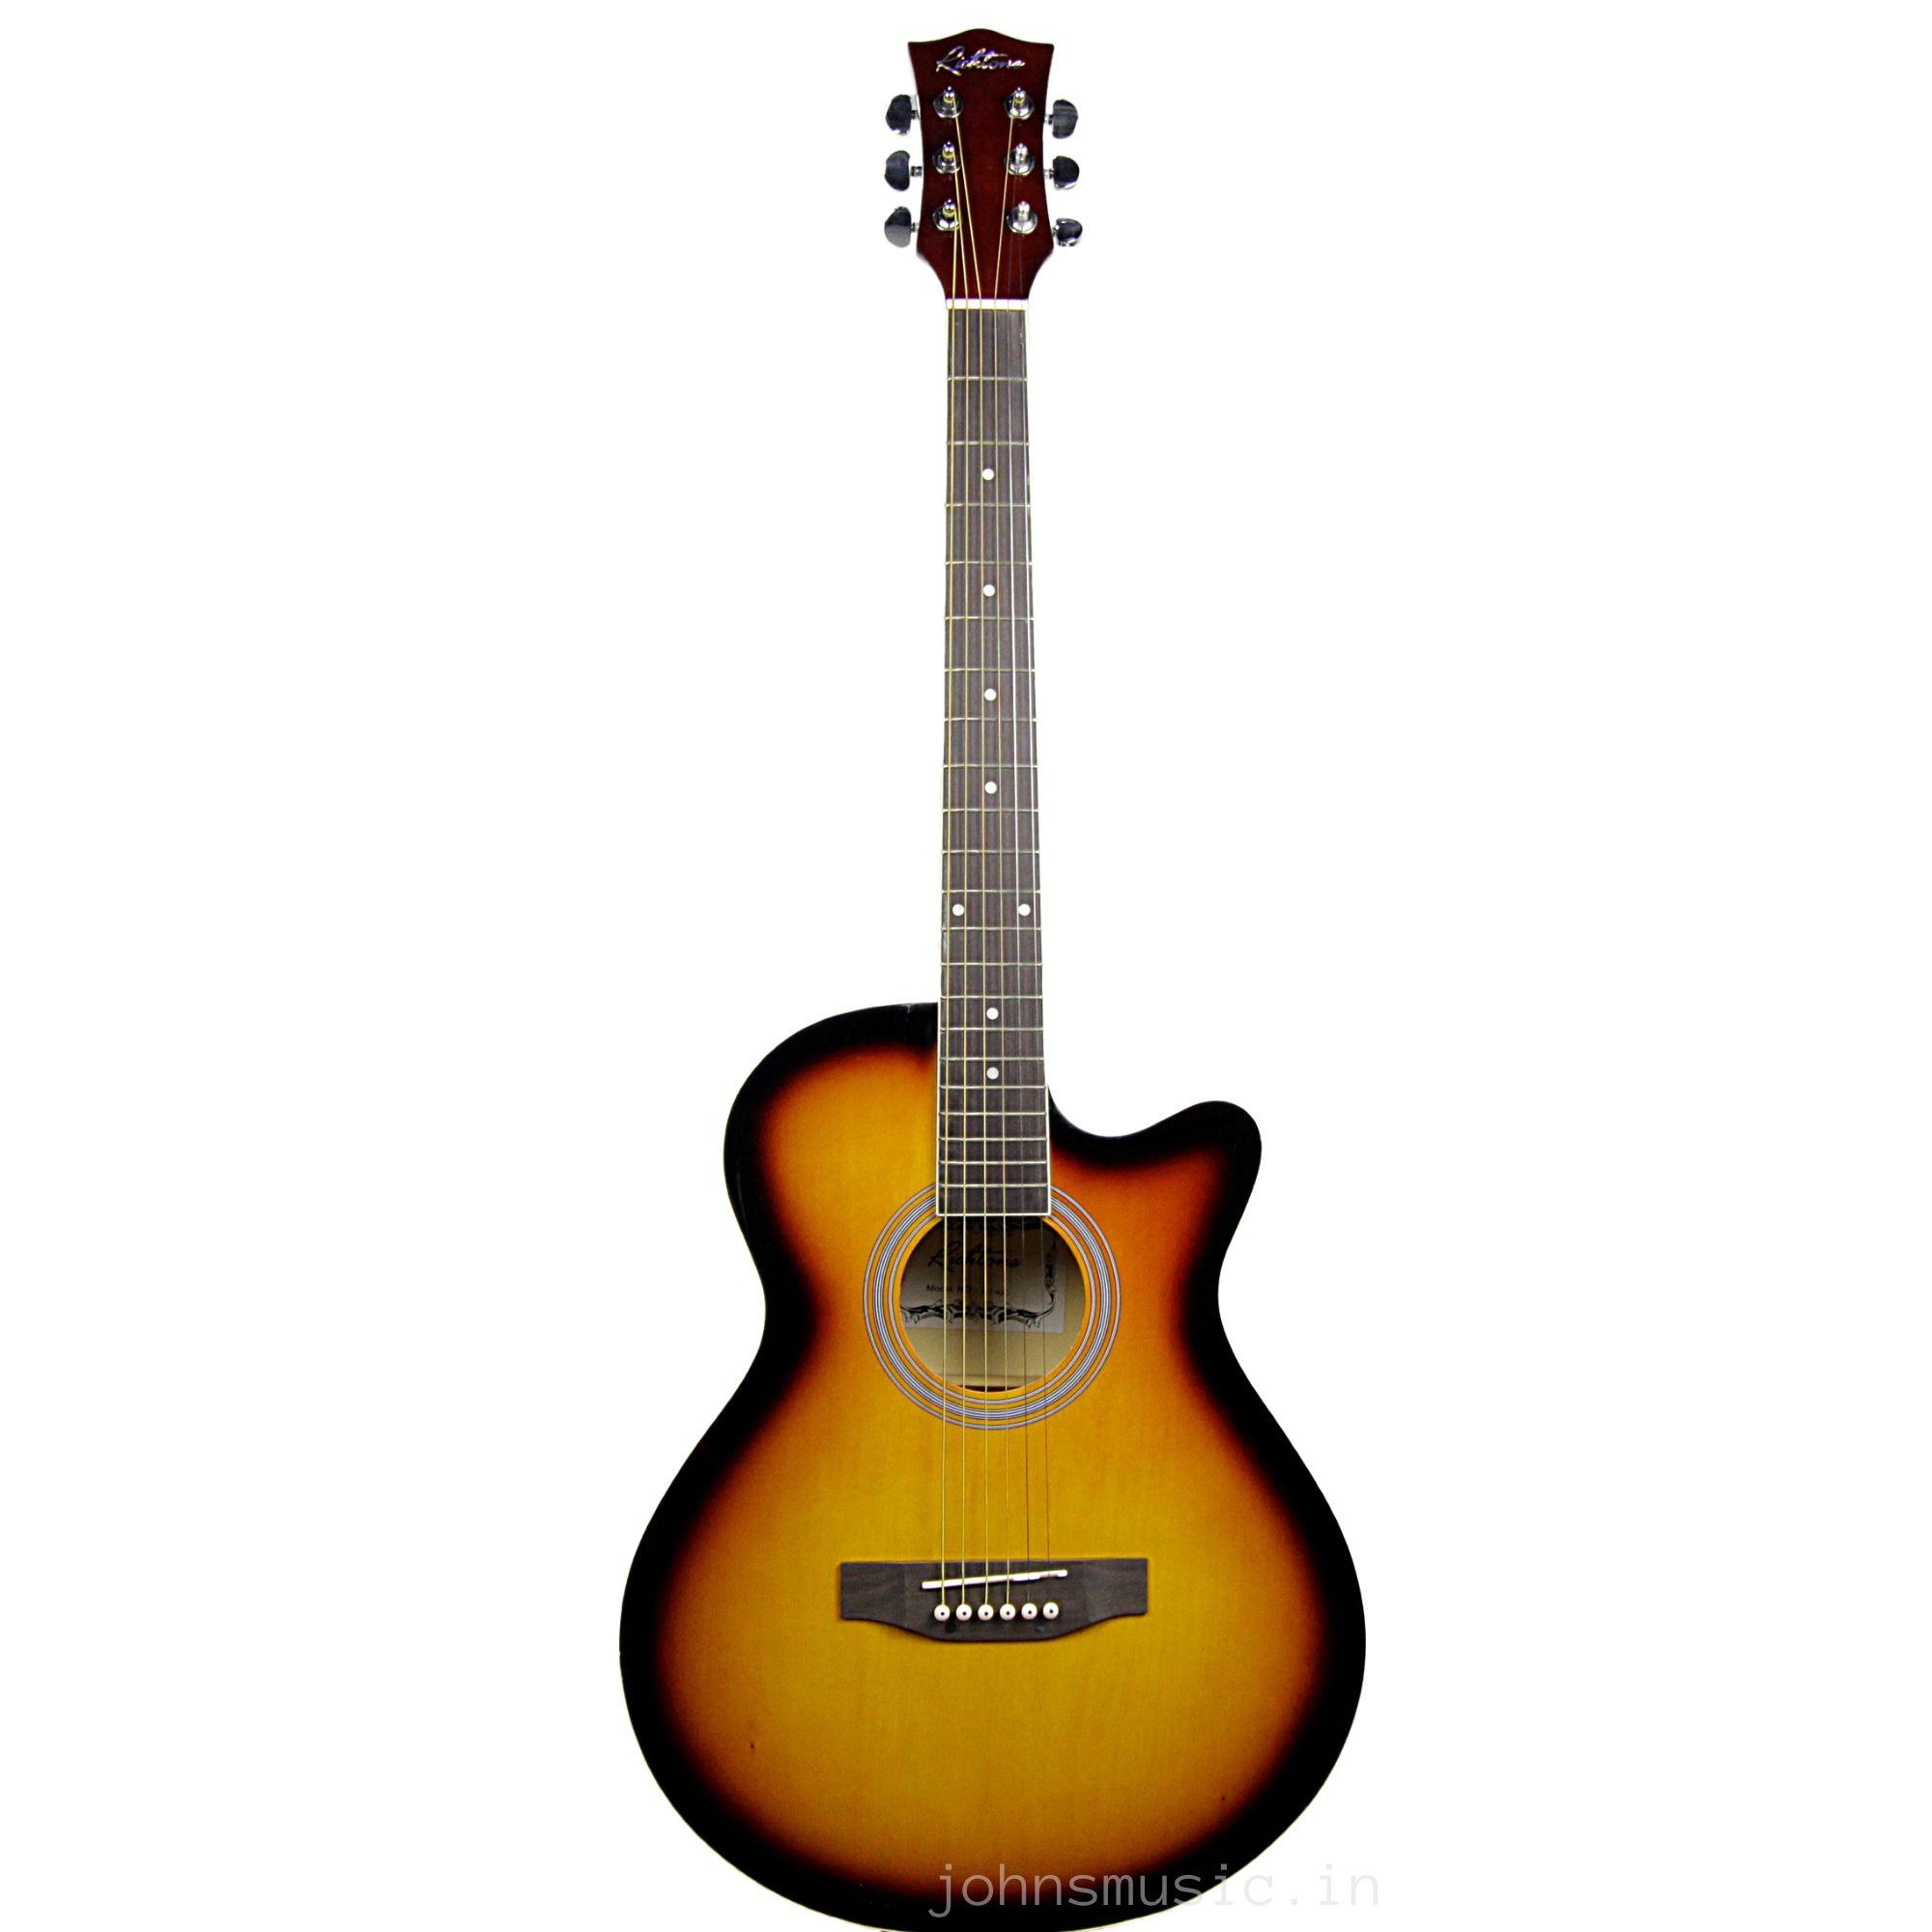 Richtone Acoustic Gutiar 40 Inch Buy Beginner Guitars Online In India Johnsmusic In